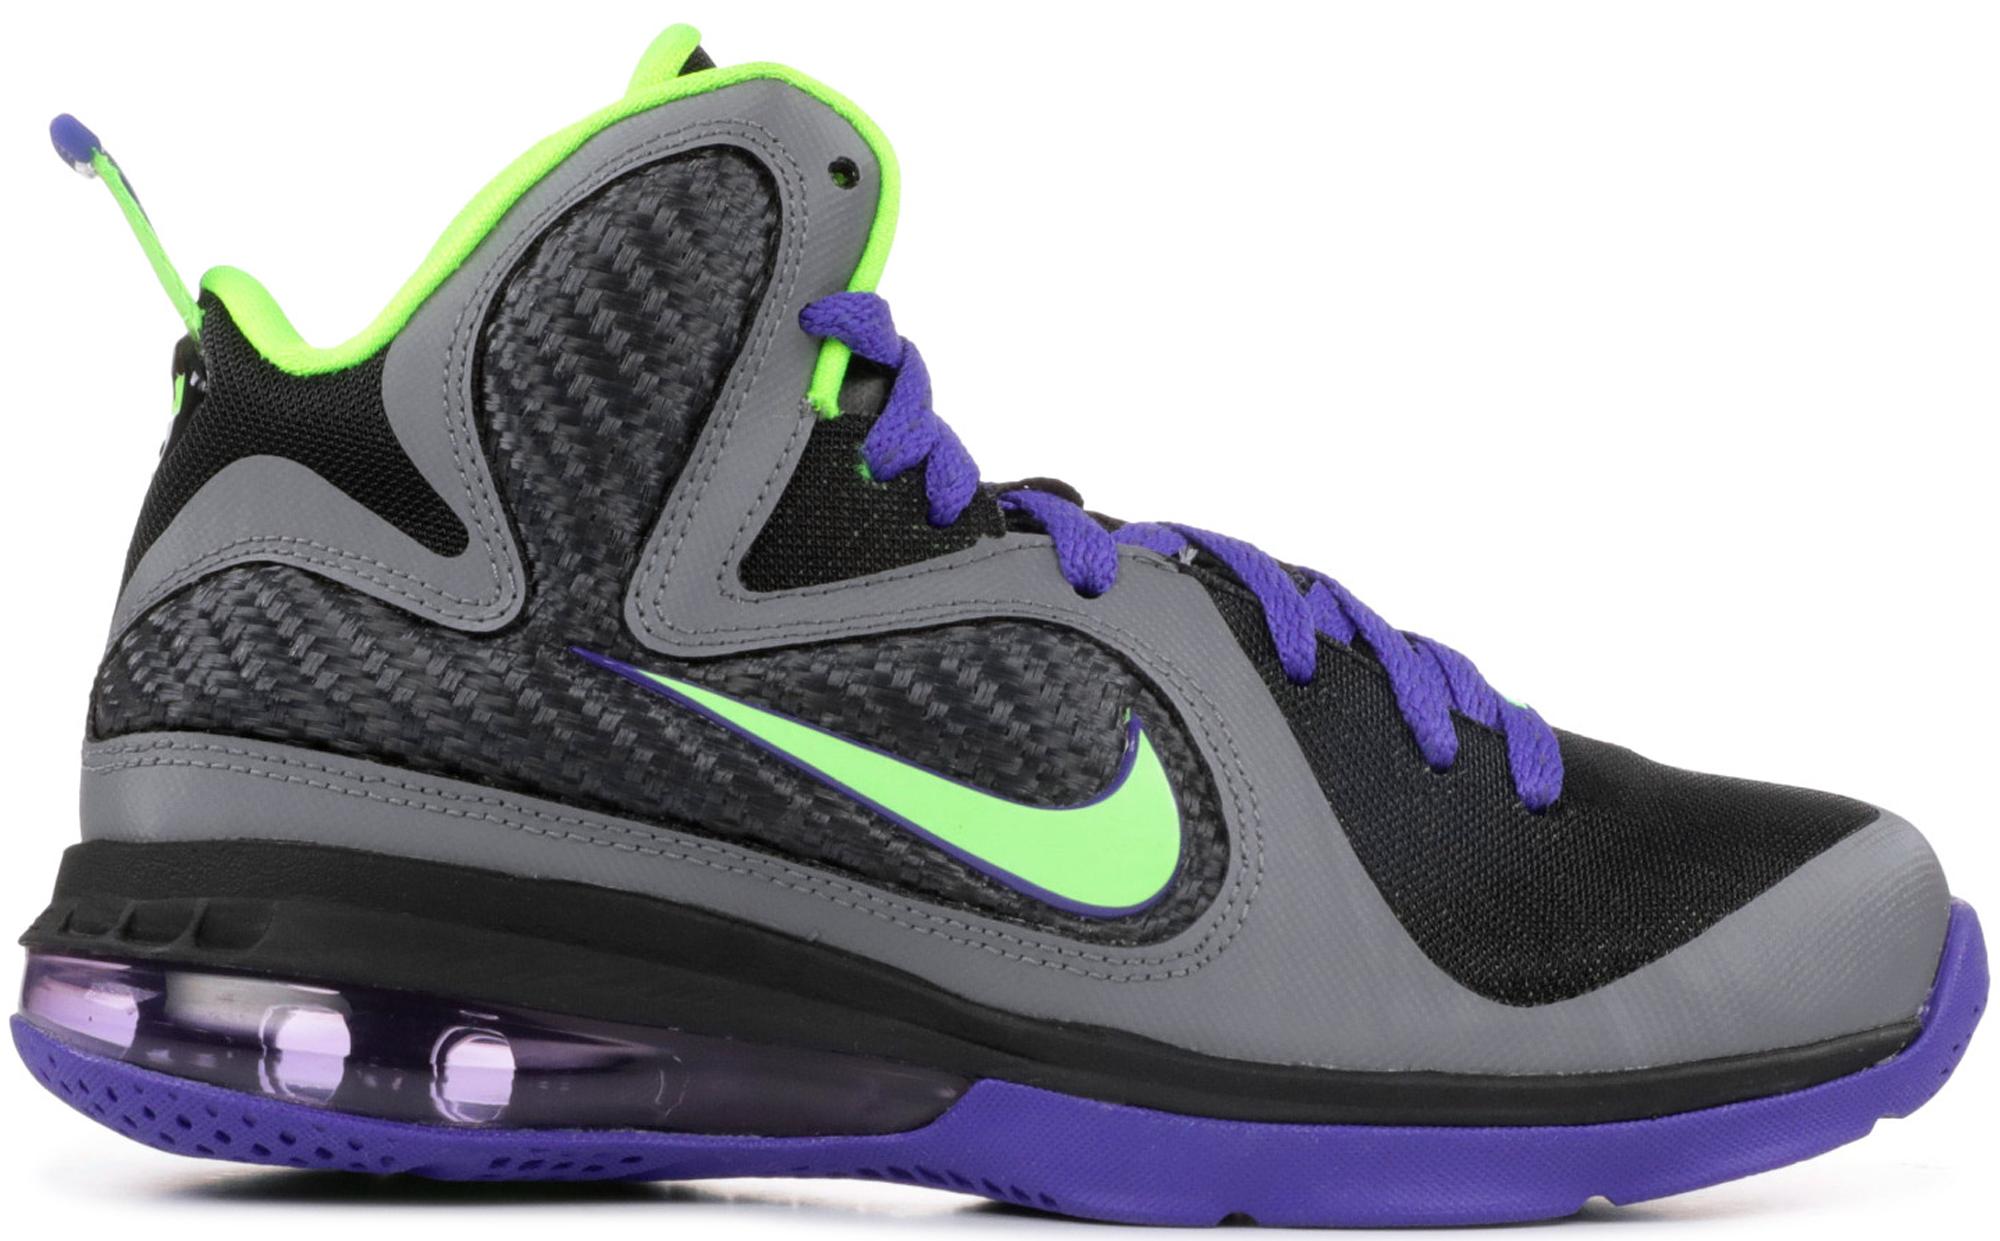 Nike LeBron 9 Black Electric Green